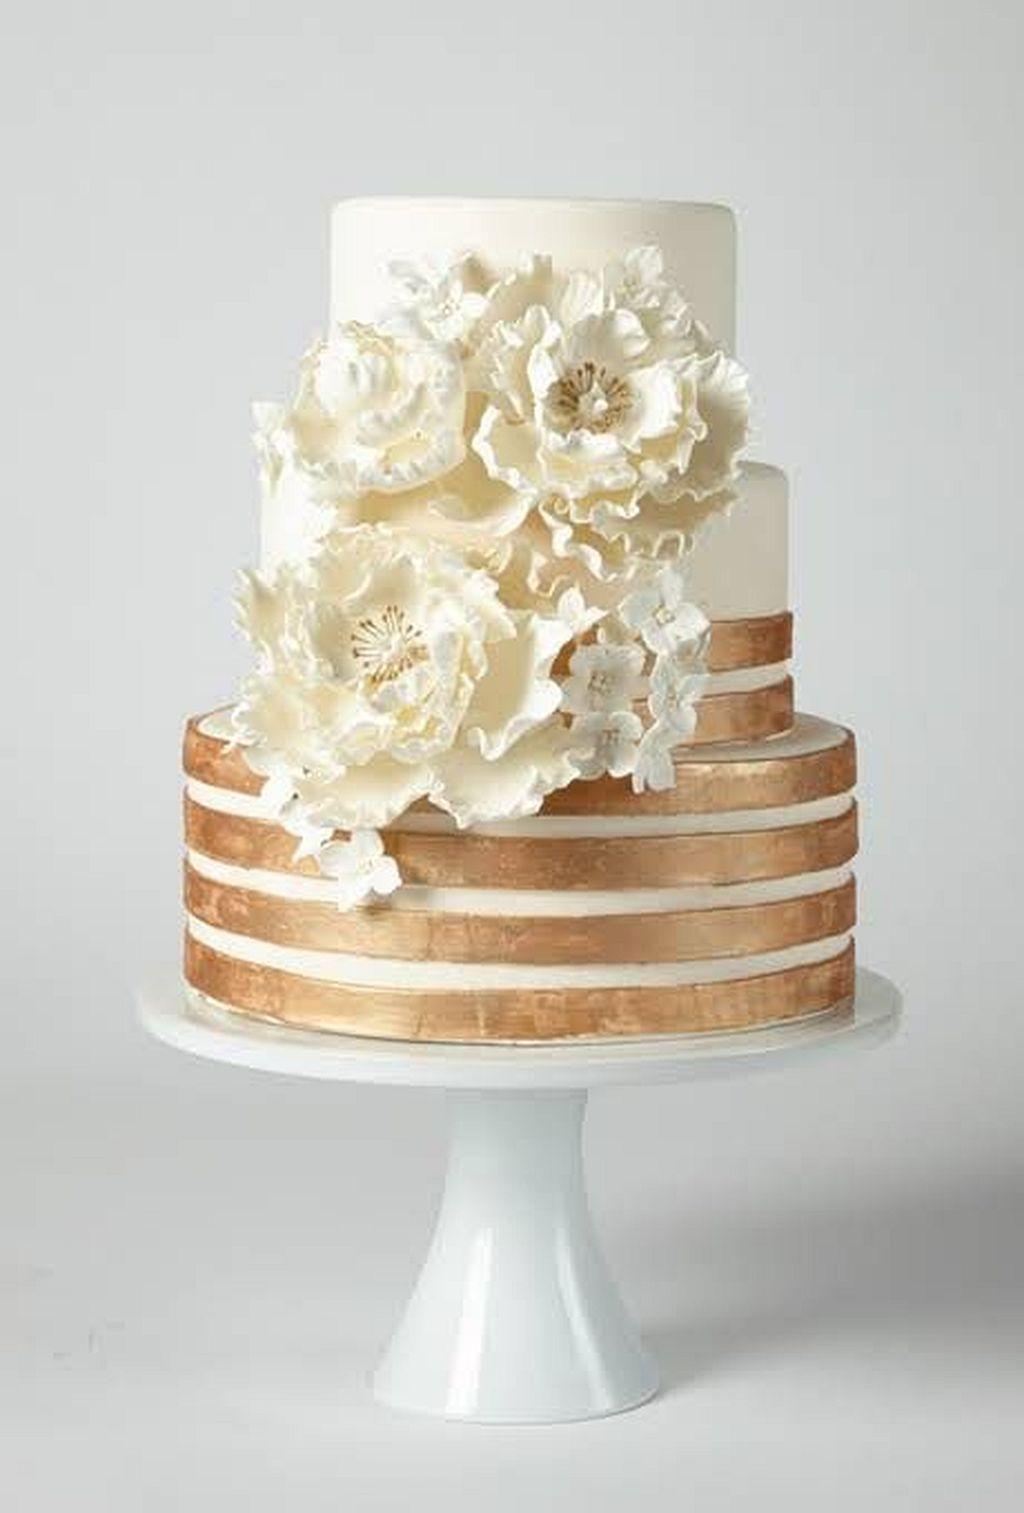 The 20 Prettiest Wedding Cakes